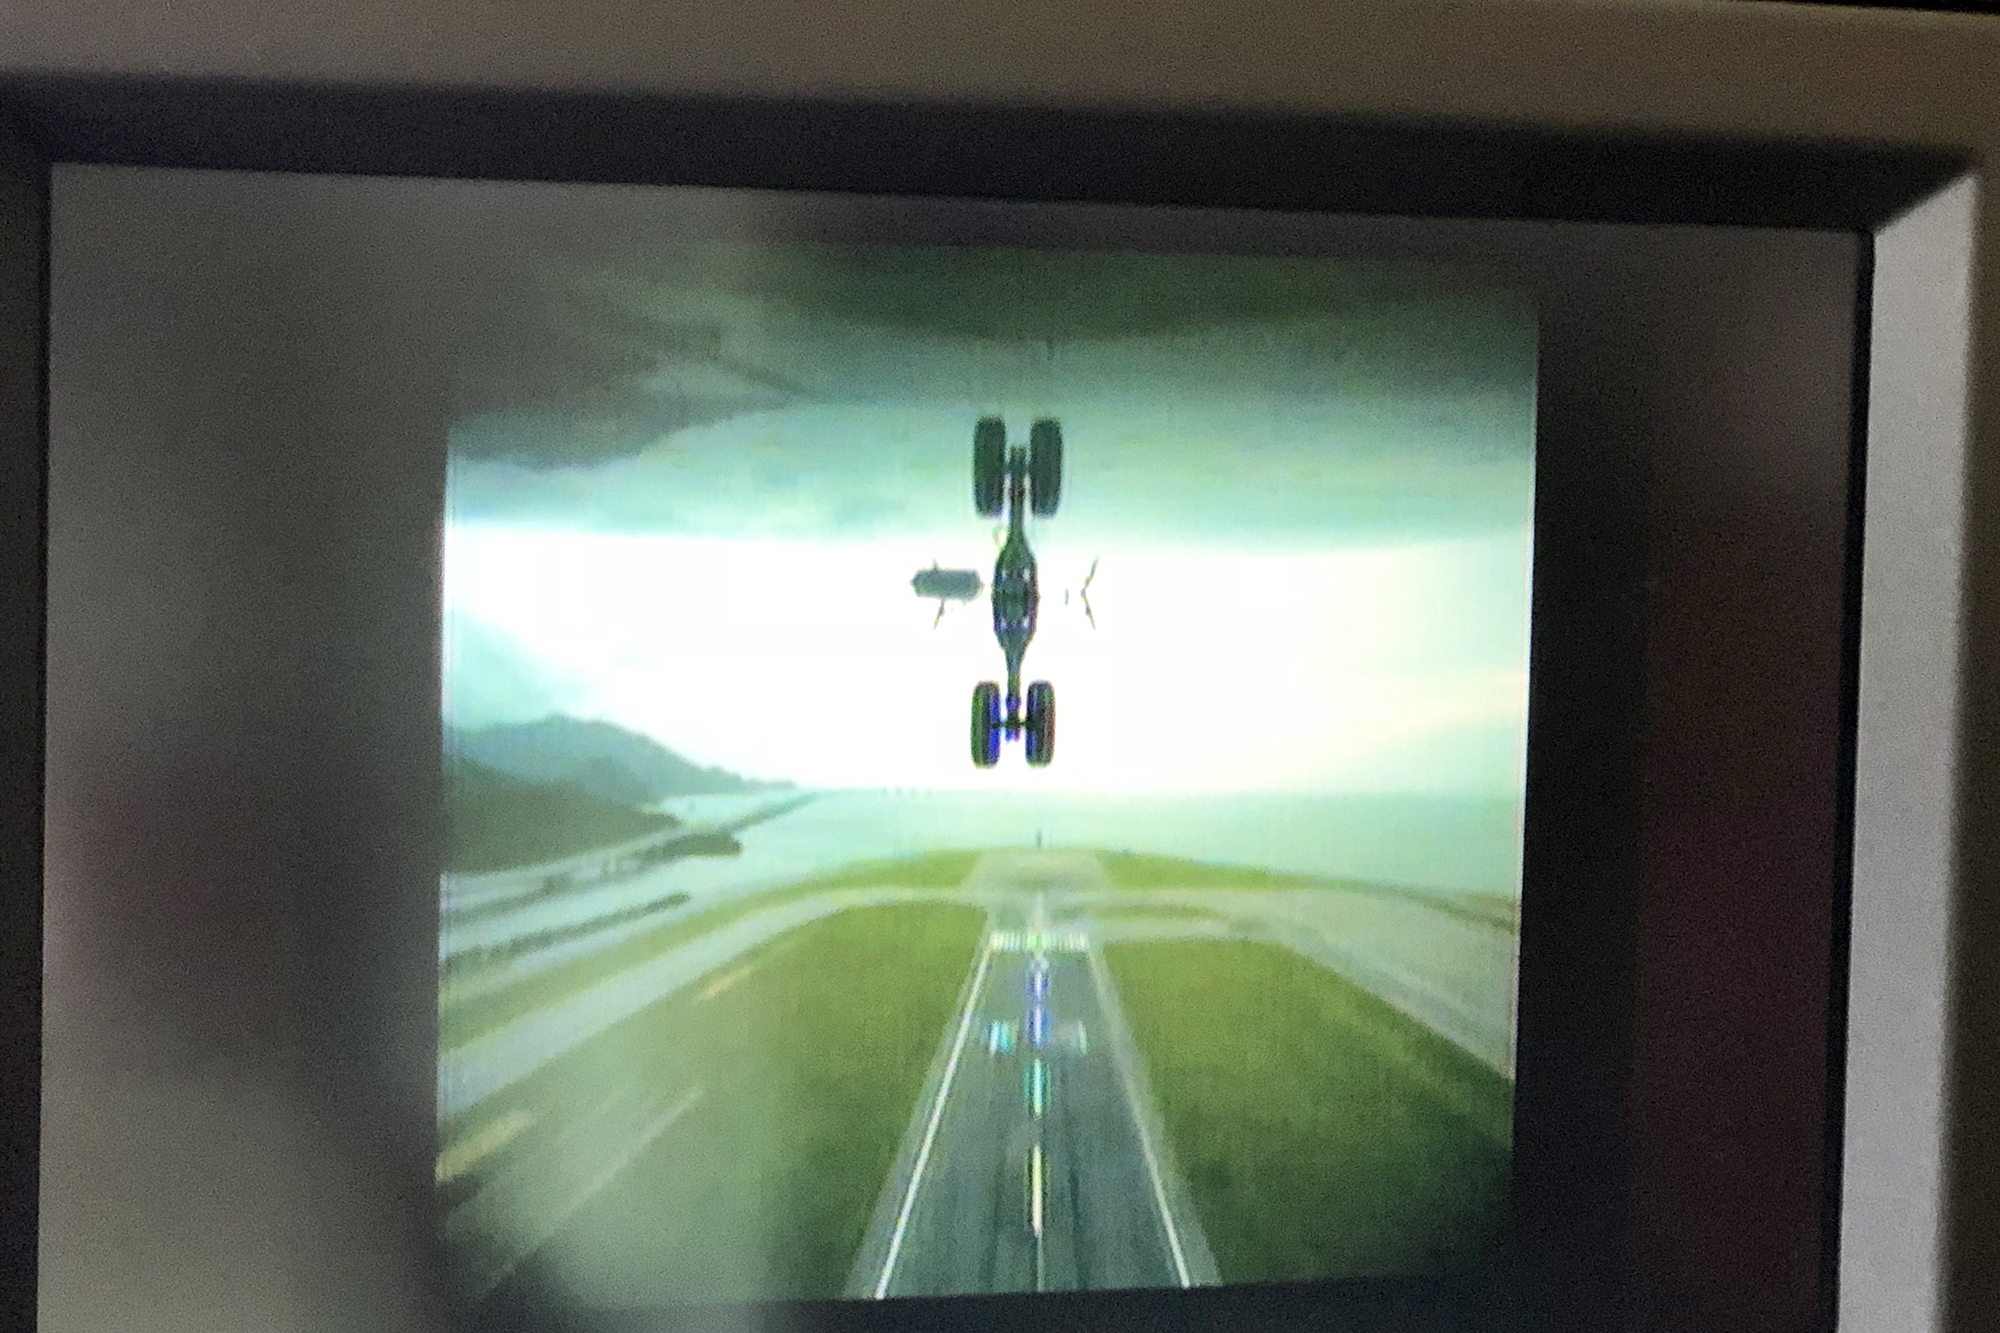 Takeoff Camera